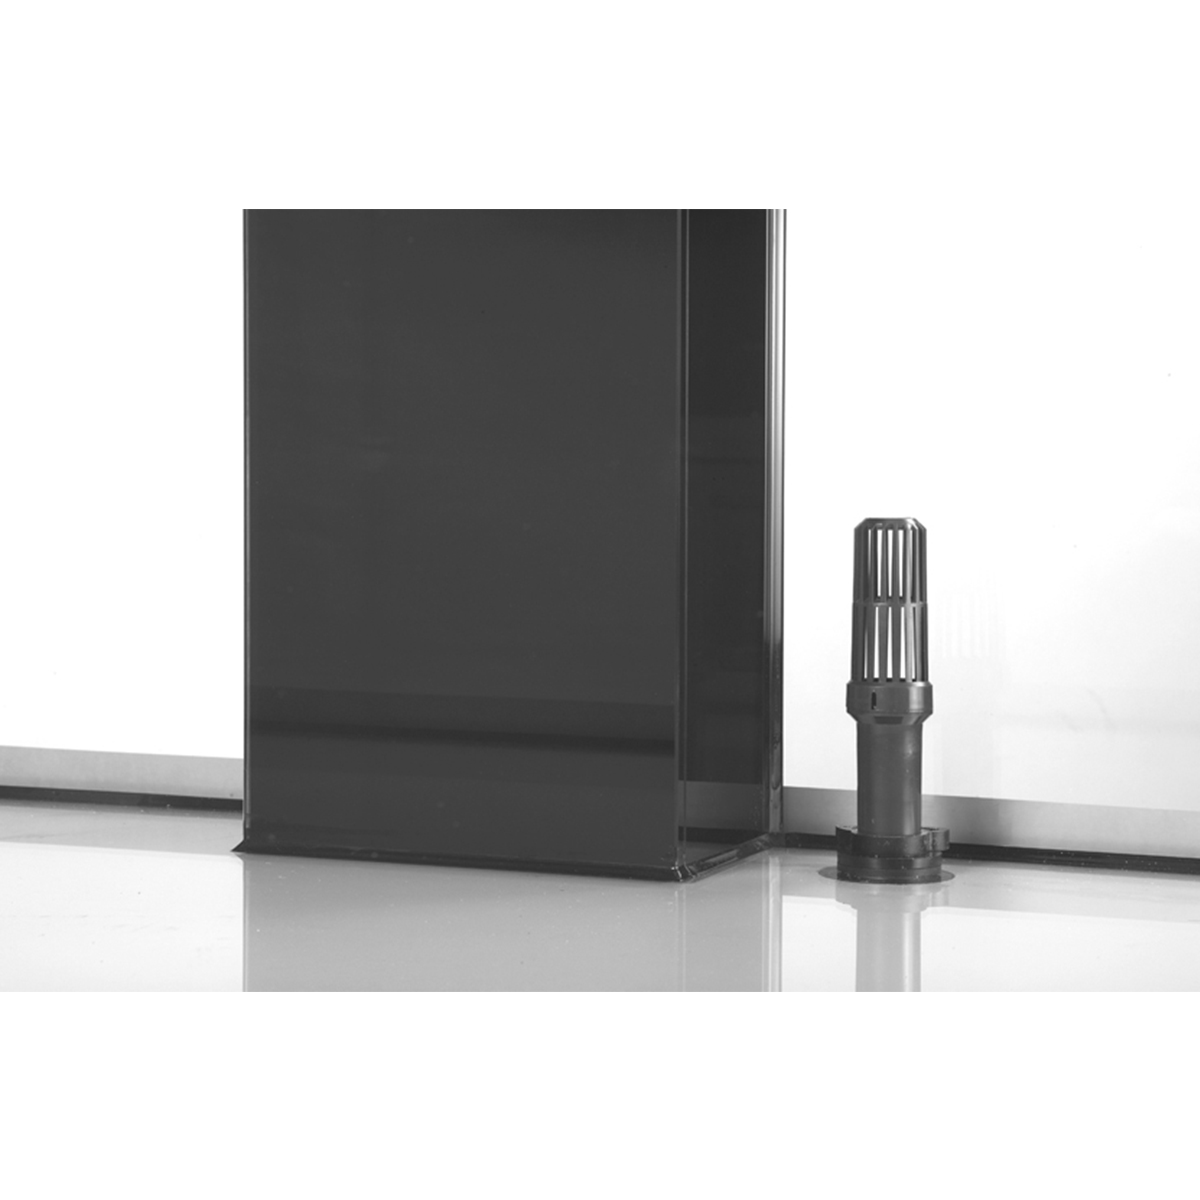 eheim incpiria 600 mit led beleuchtung kaufen bei zooroyal. Black Bedroom Furniture Sets. Home Design Ideas